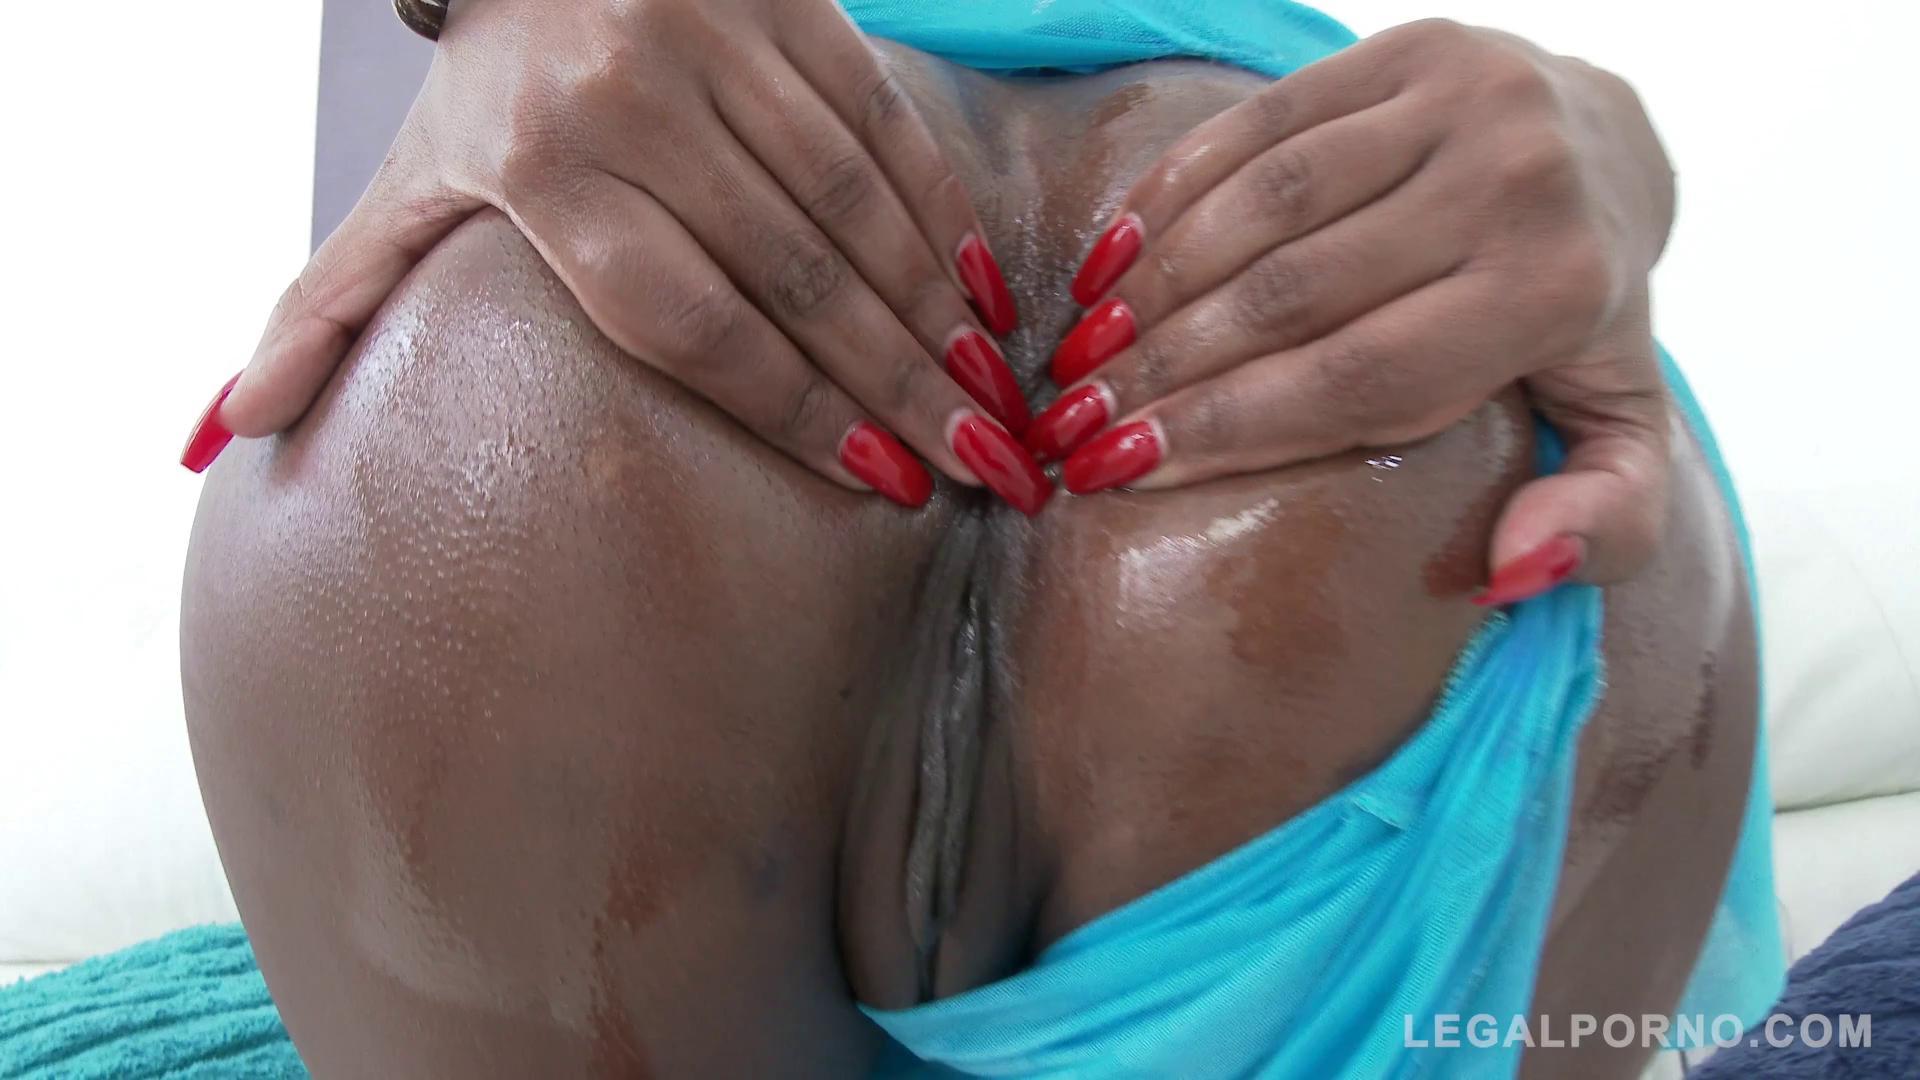 LegalPorno Exotic Slut Saritha DAP Ed By Mike Angelo And Erik Everhard SZ1315